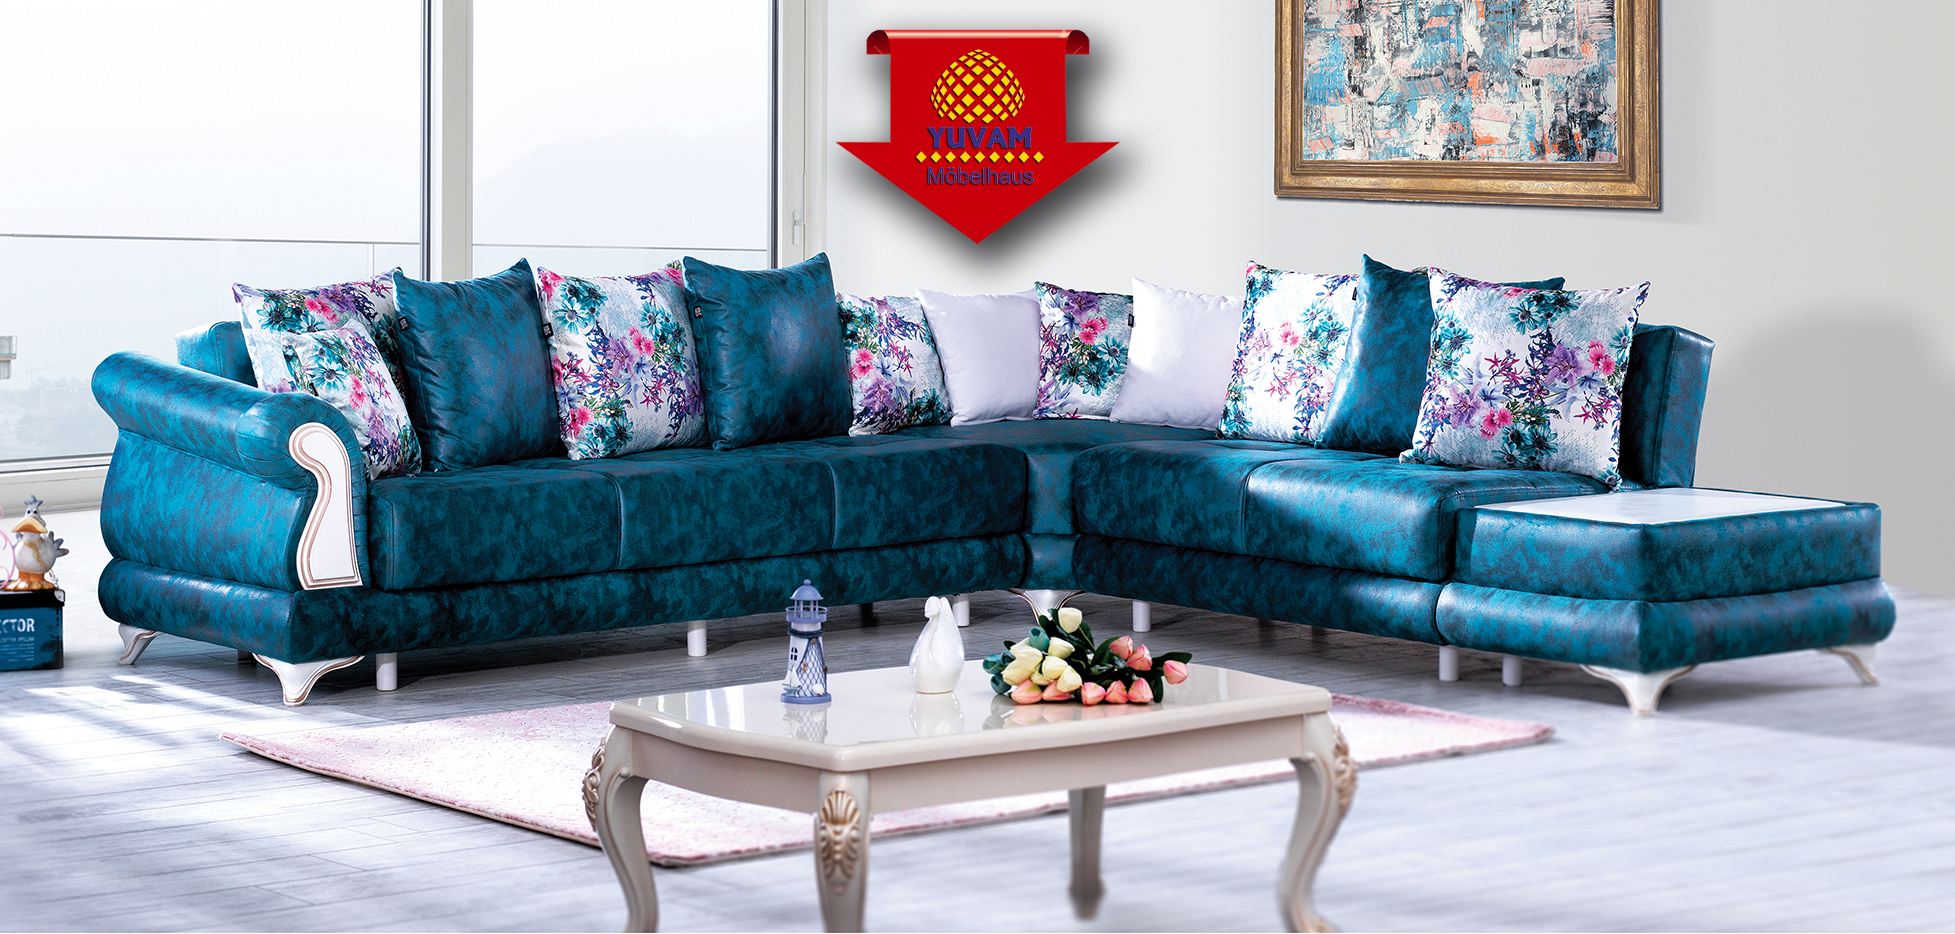 favori sitzecke 3 v 2 yuvam m belhaus in wuppertal cilek offizieller h ndler in europa. Black Bedroom Furniture Sets. Home Design Ideas